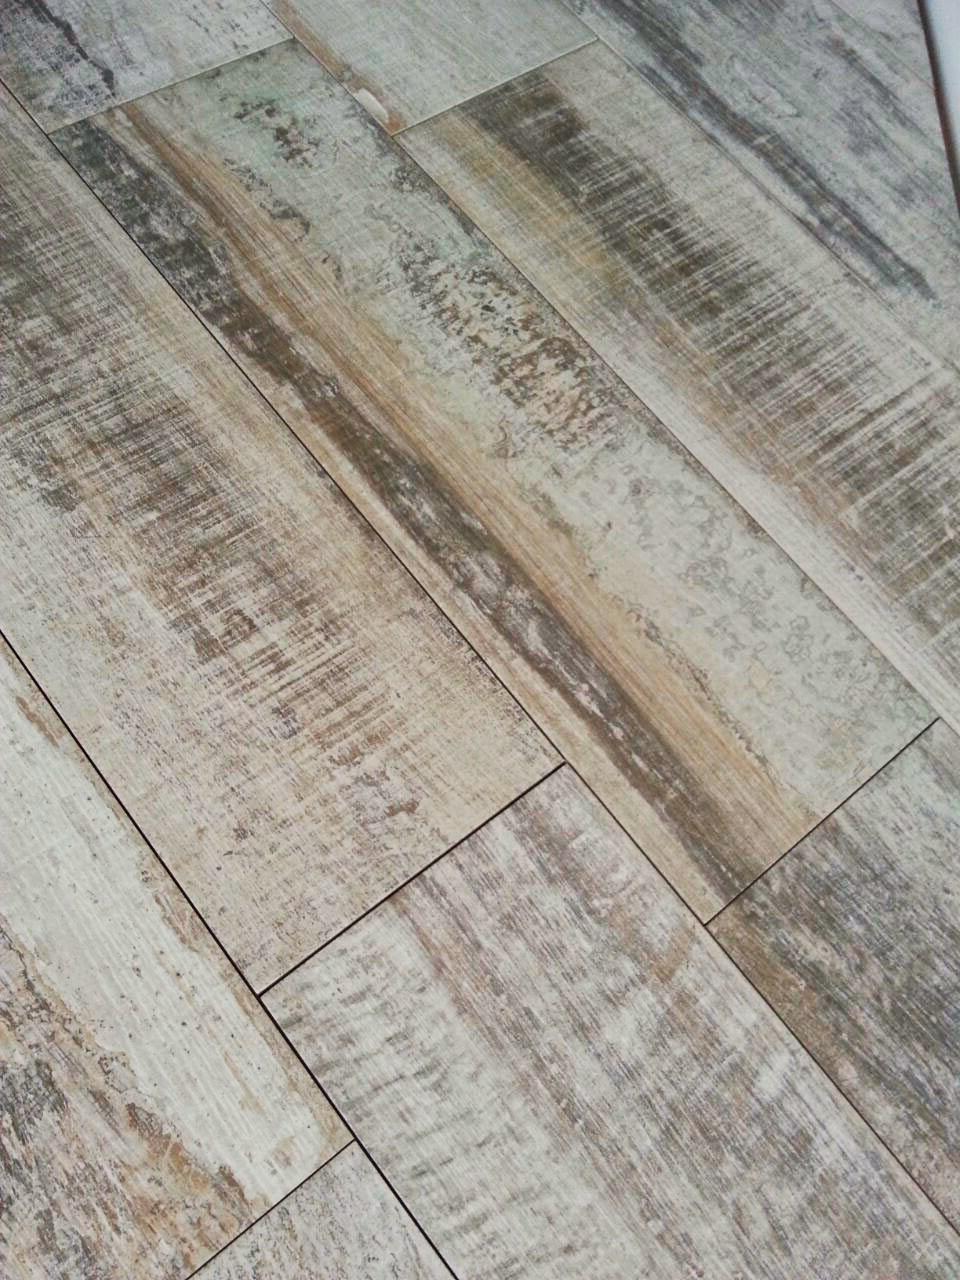 Gtp tarragona reforma la terraza - Ceramica imitacion madera exterior ...